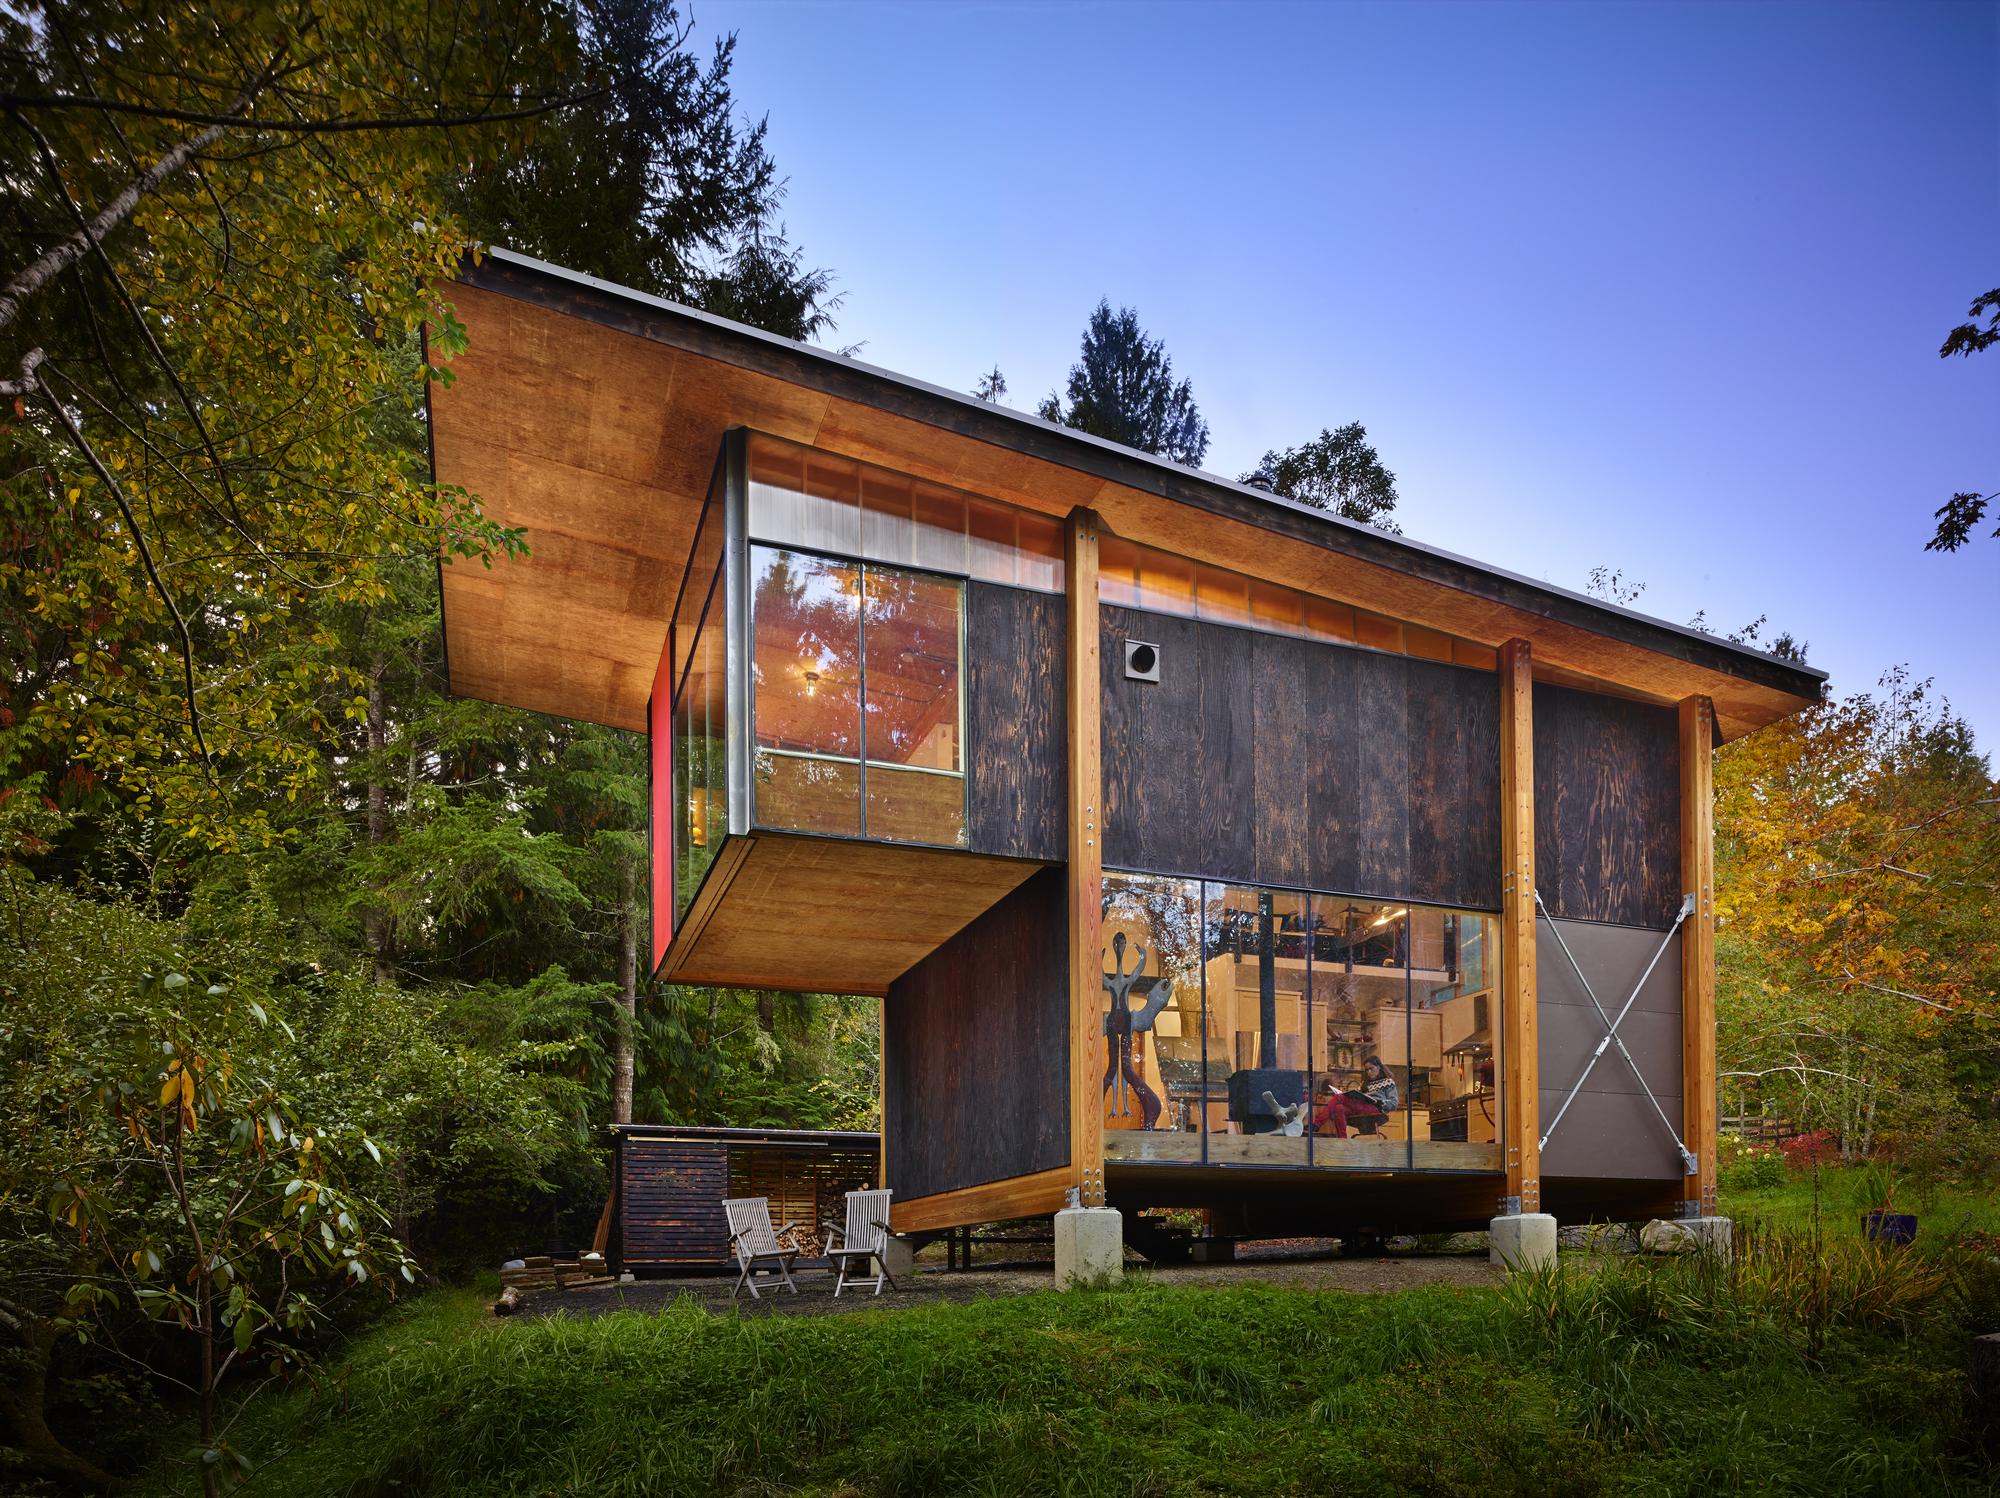 Estudio Scavenger / Eerkes Architects + Olson Kundig